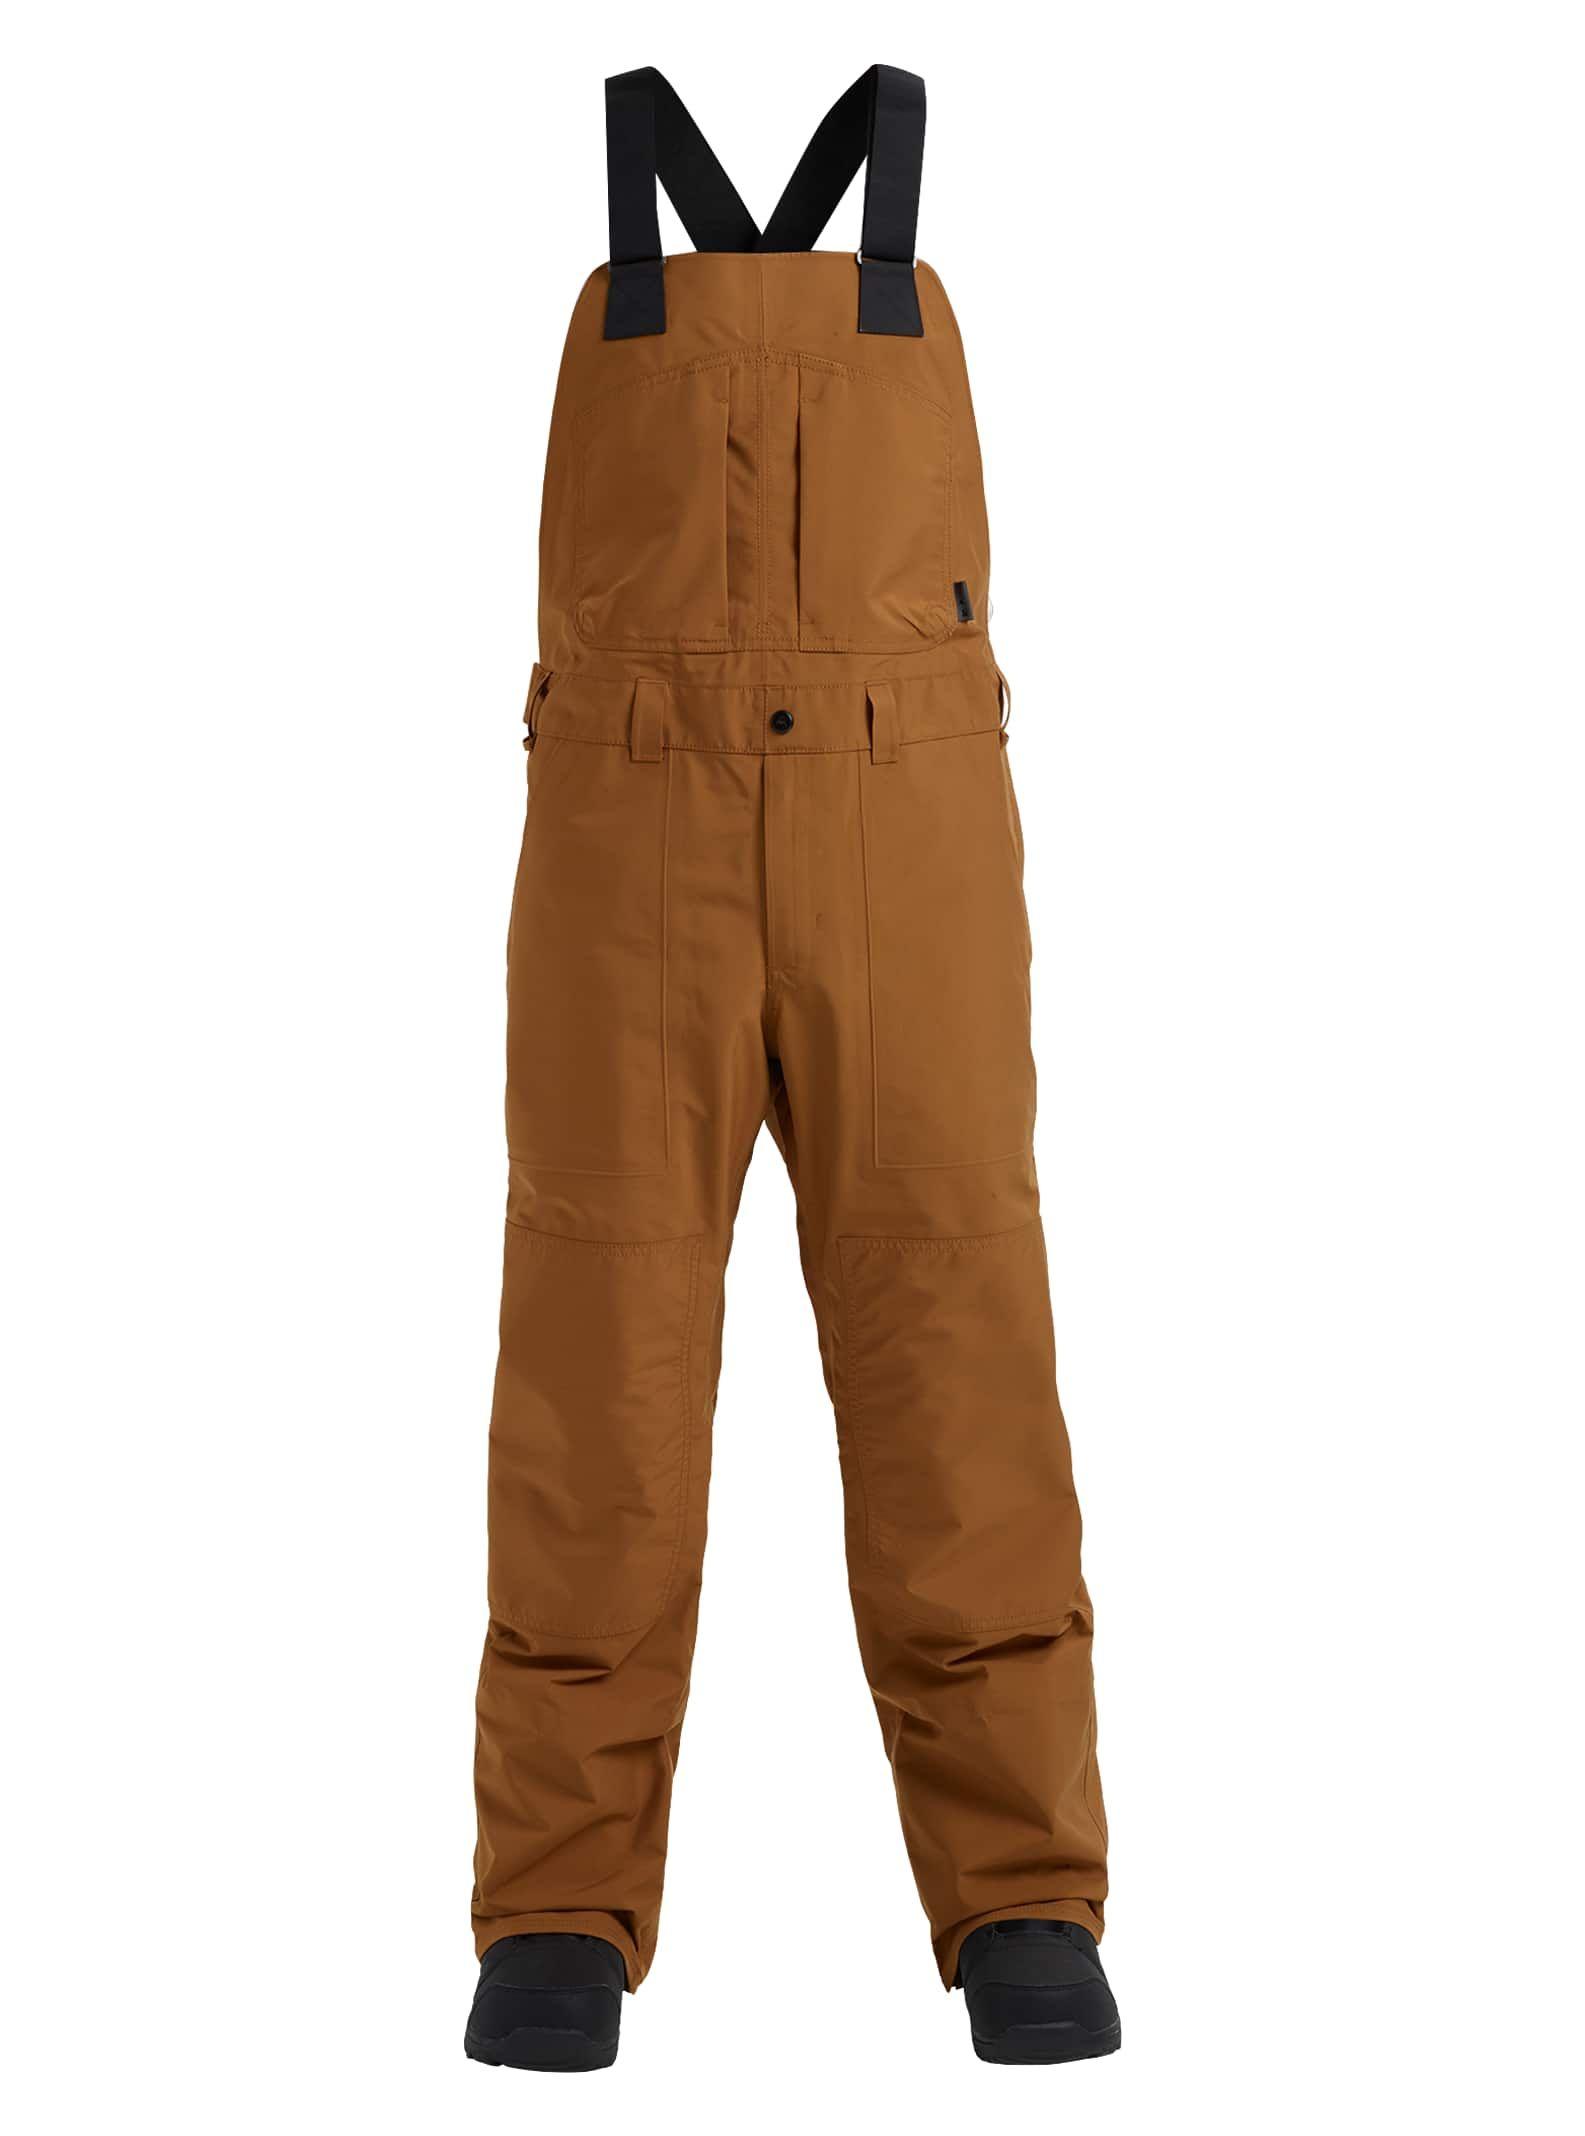 7576ebeb9c Men's Carhartt WIP x Burton Worthley 3L Bib Pant | Products | Pants ...